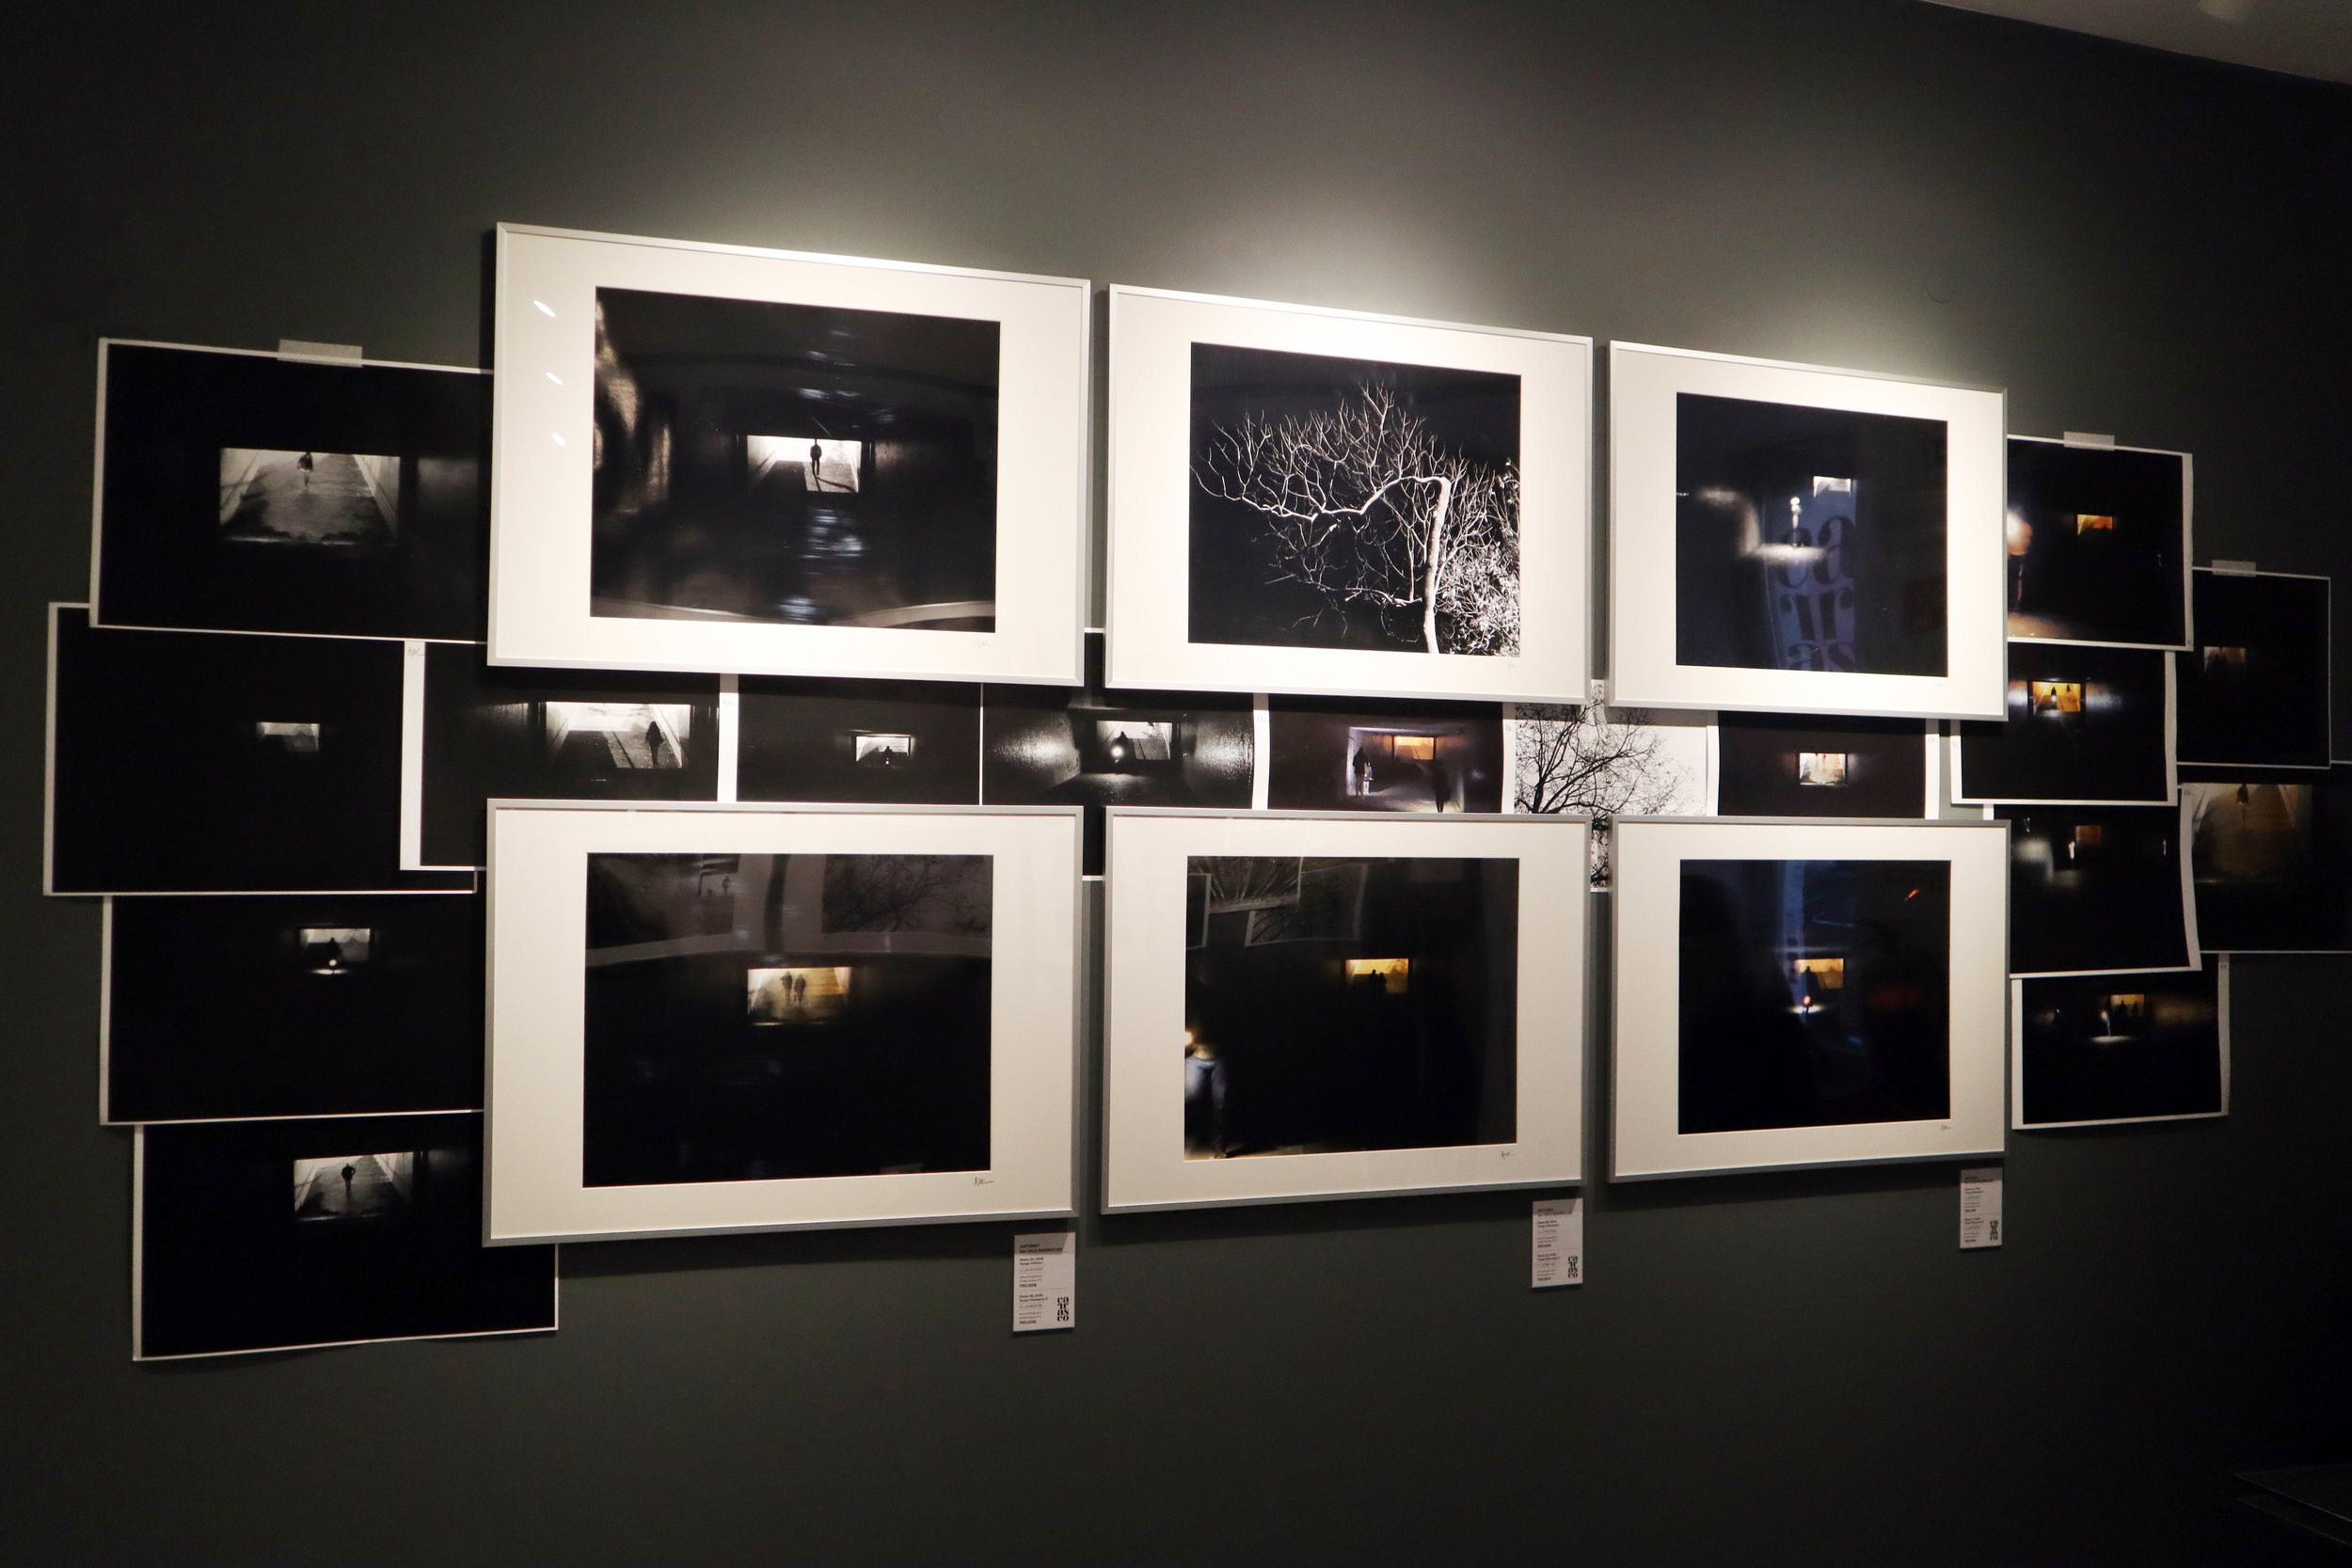 CARRASCO_art_gallery_DESOBJECTION_C.jpg